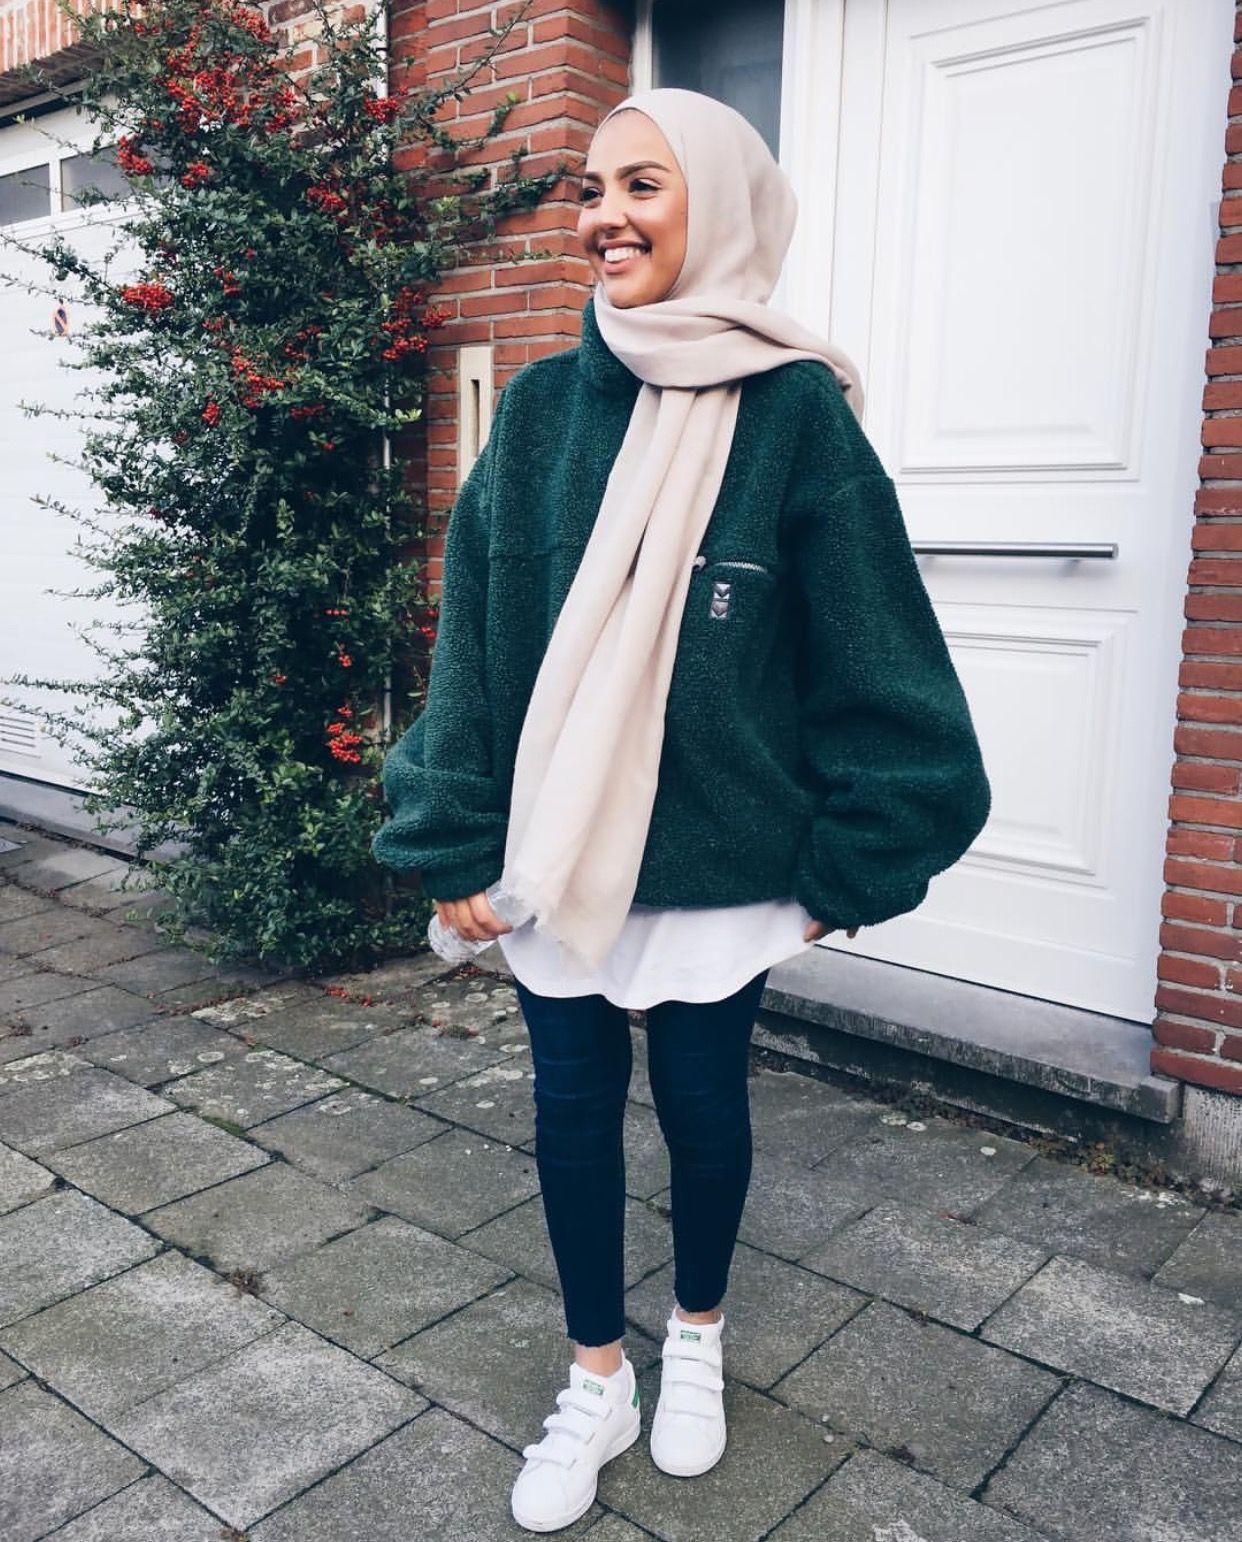 Pinterest @adarkurdish  Hijabista fashion, Muslimah fashion